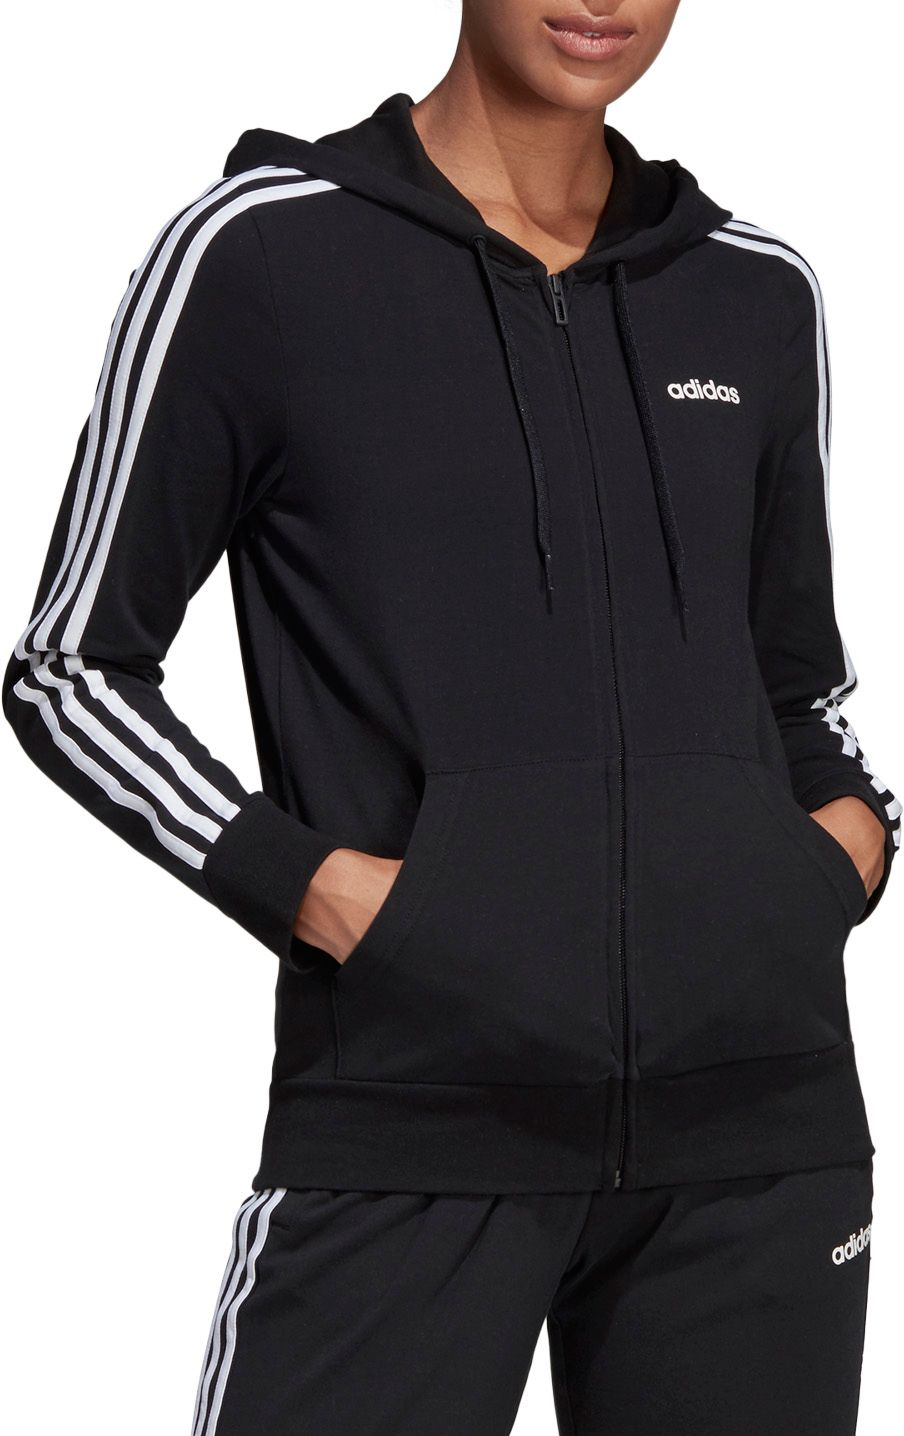 adidas zip sweatshirt